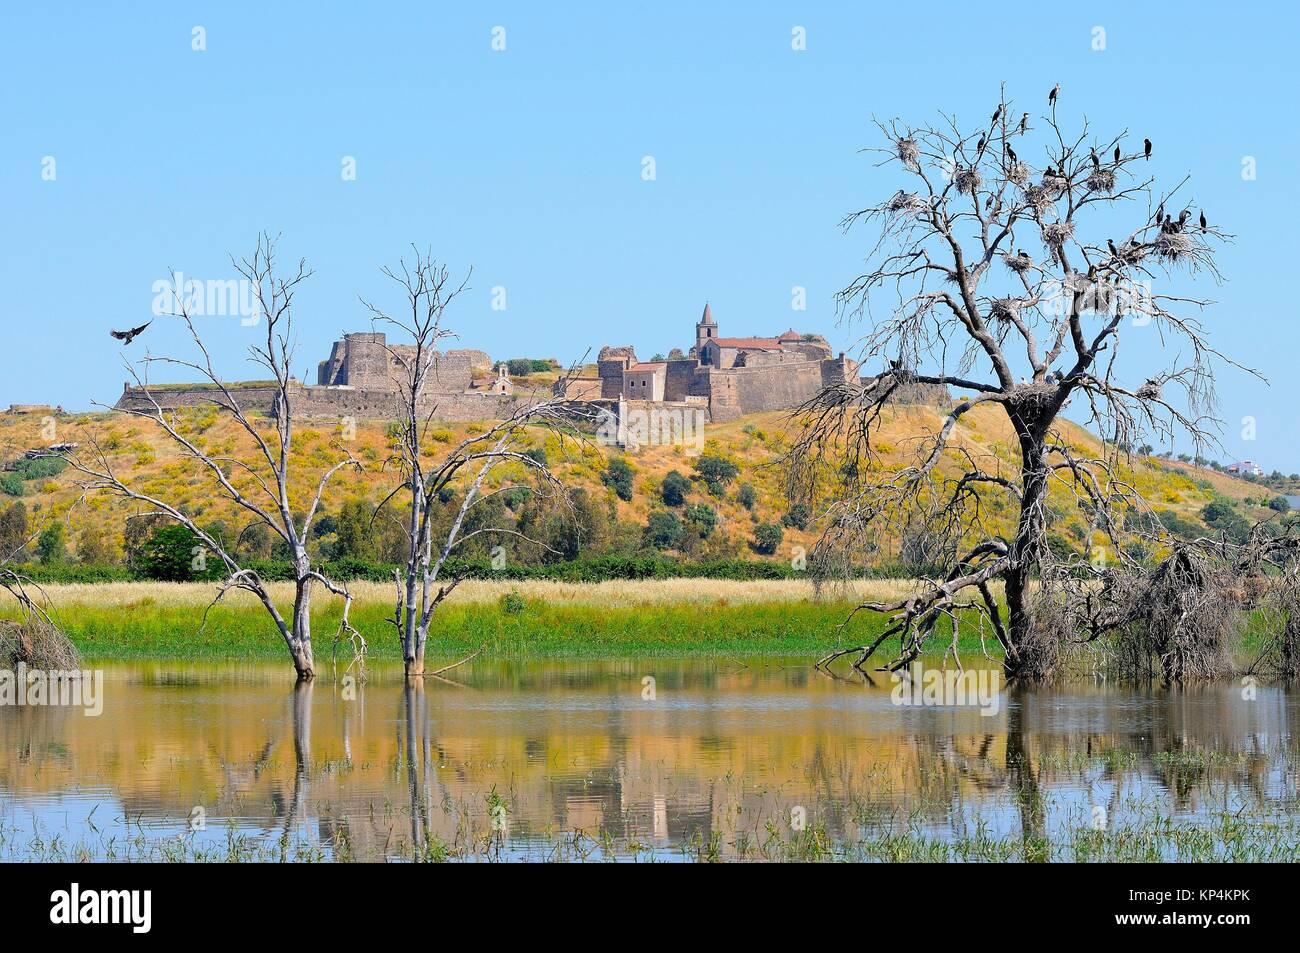 Fort of Juromenha and breeding colony of cormorants.Guadiana river.Alentejo.Portugal - Stock Image